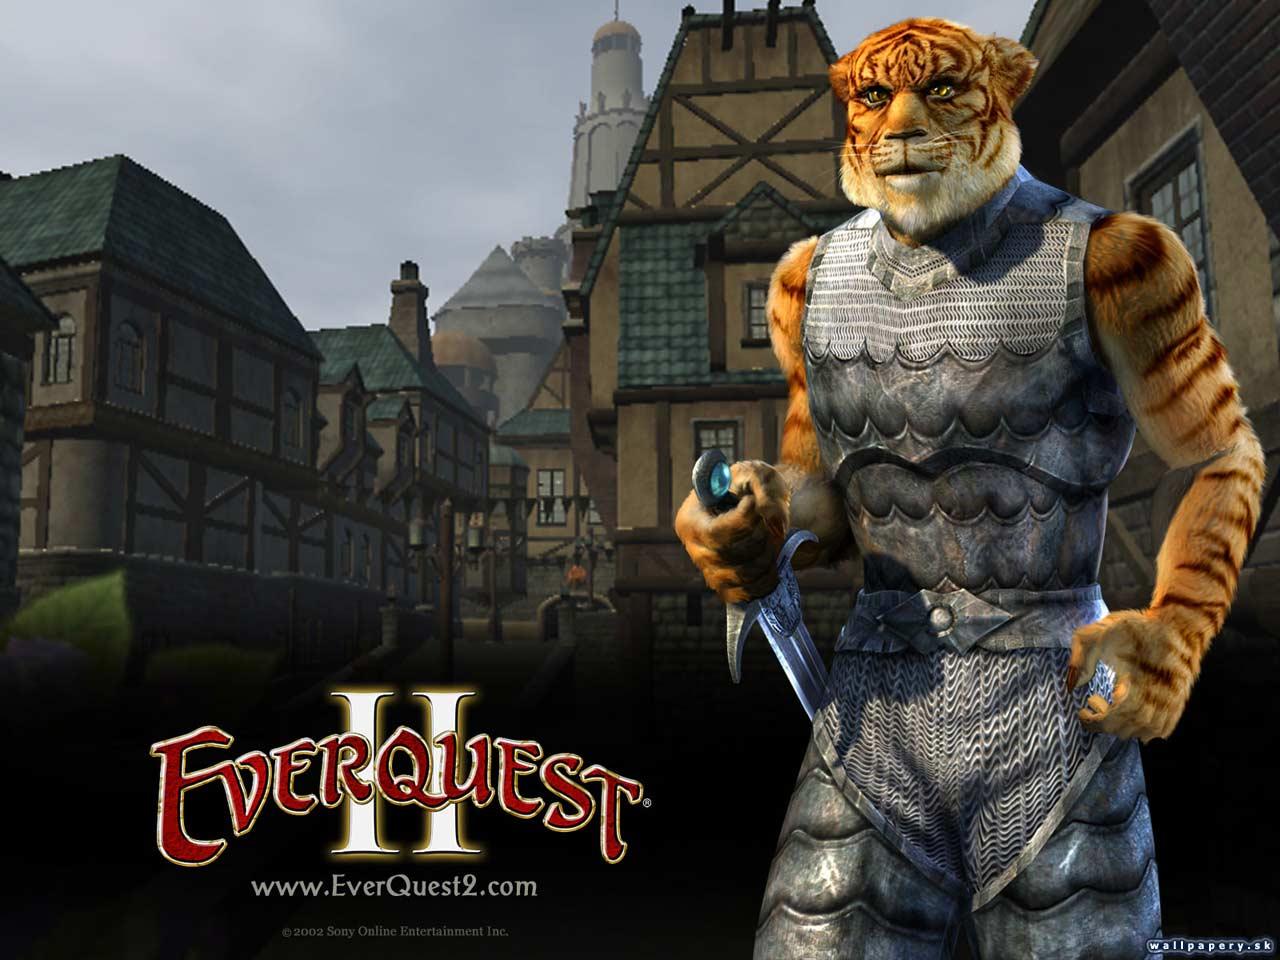 Everquest p o r n porn streaming